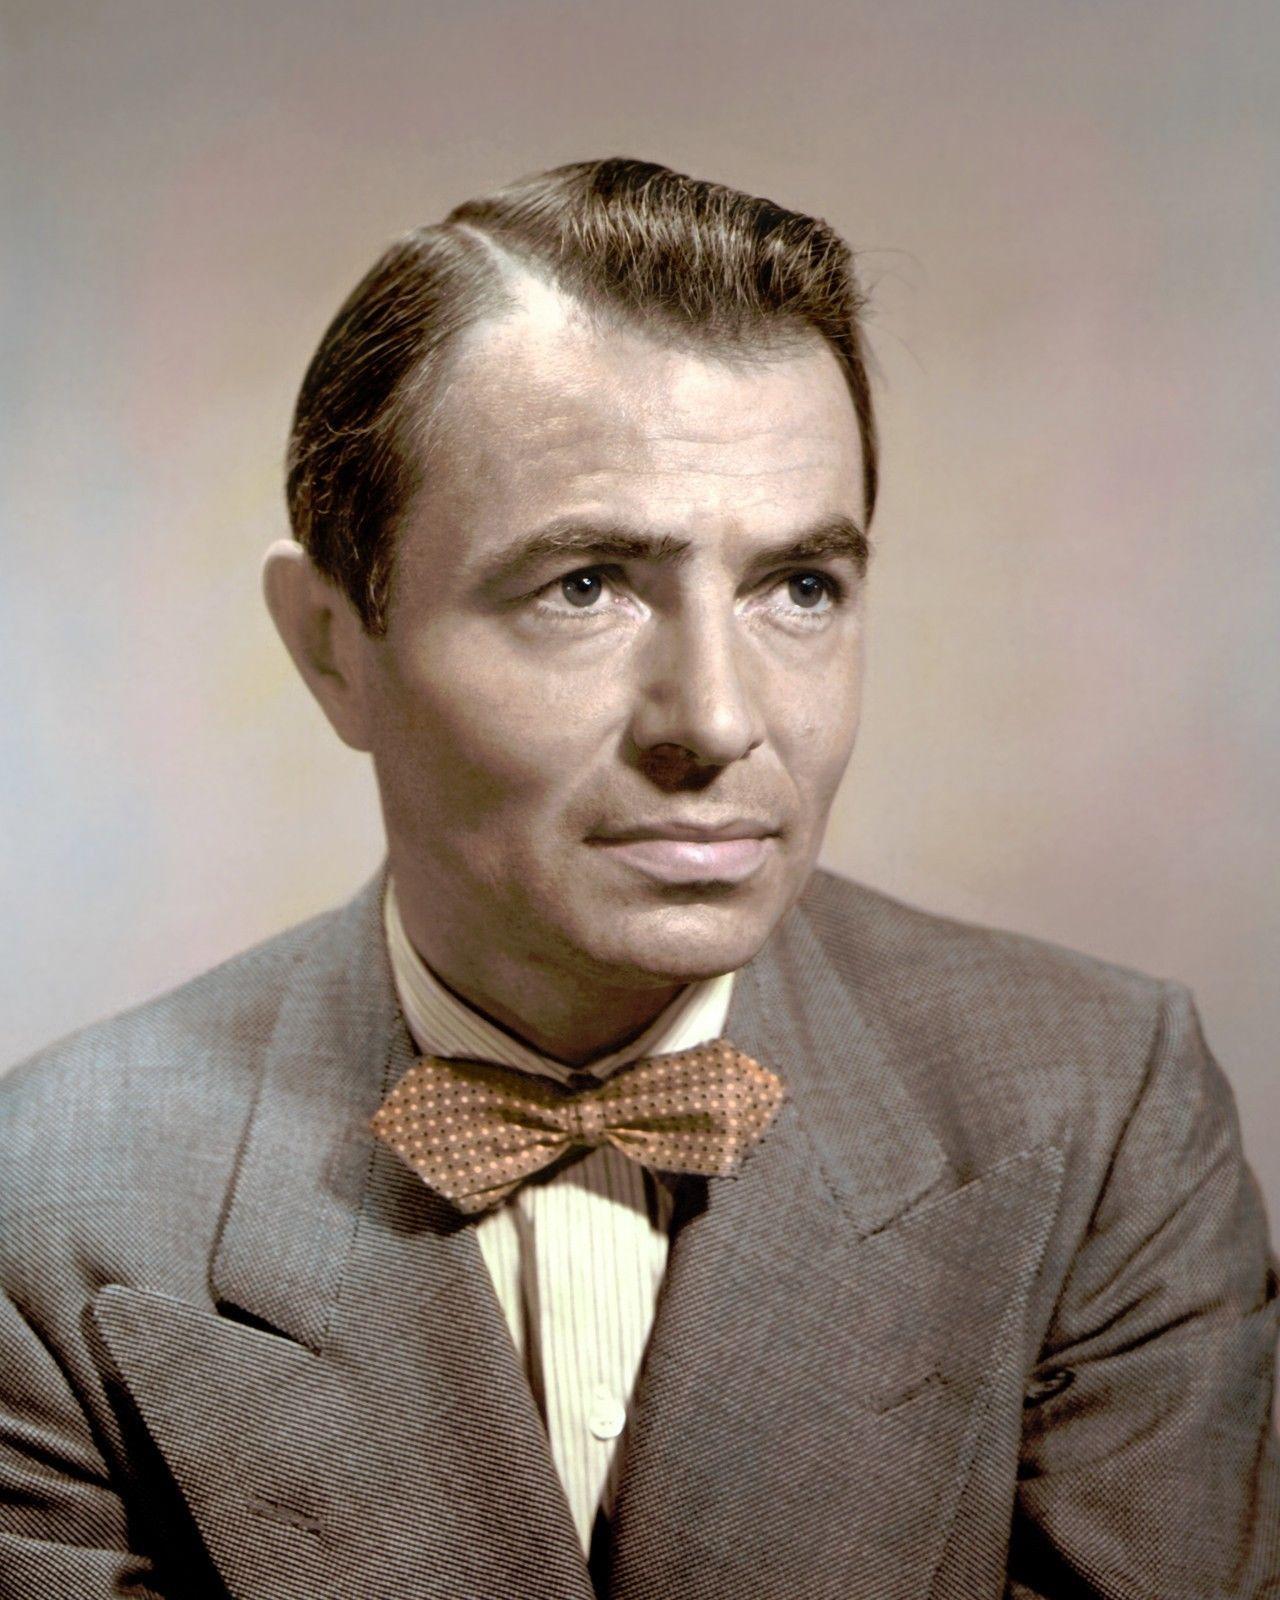 James Cagney Portrait Photo Art Hollywood Movie Star Photos 8x10